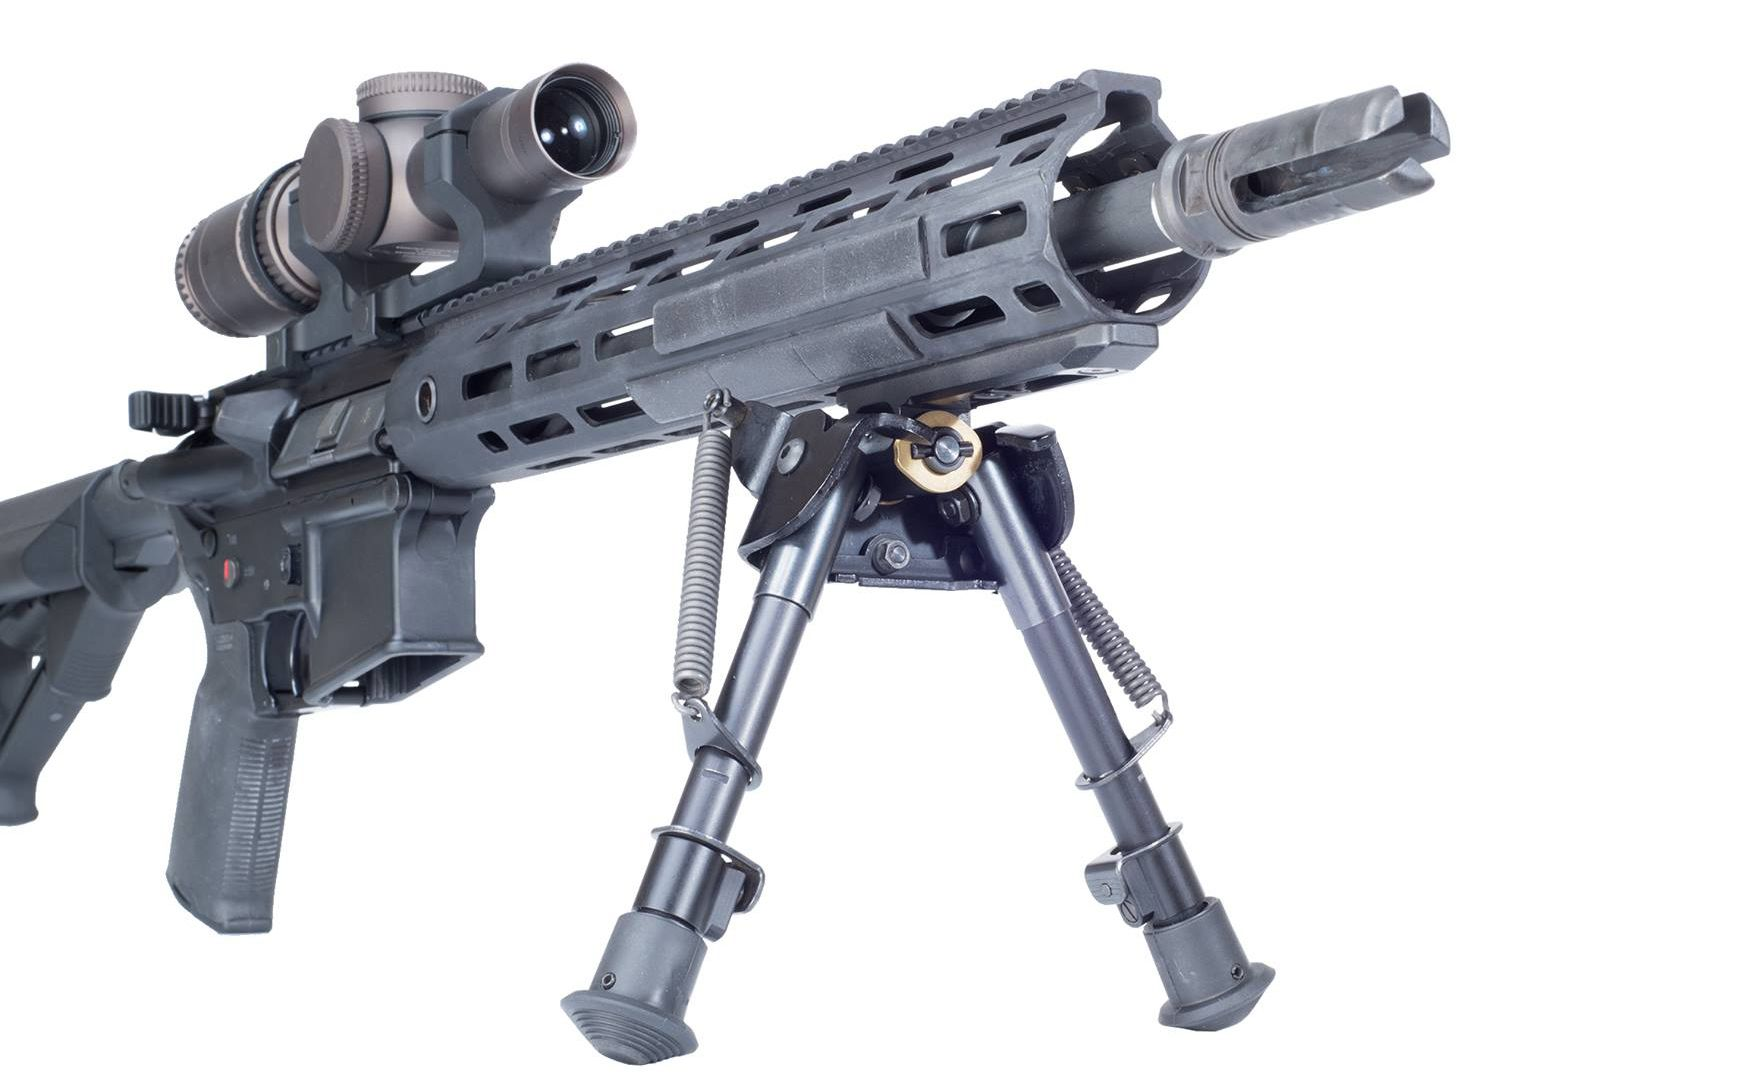 Dan Brokos on Trijicon Optics for ARs, OSS Suppressors & New Gun Owners